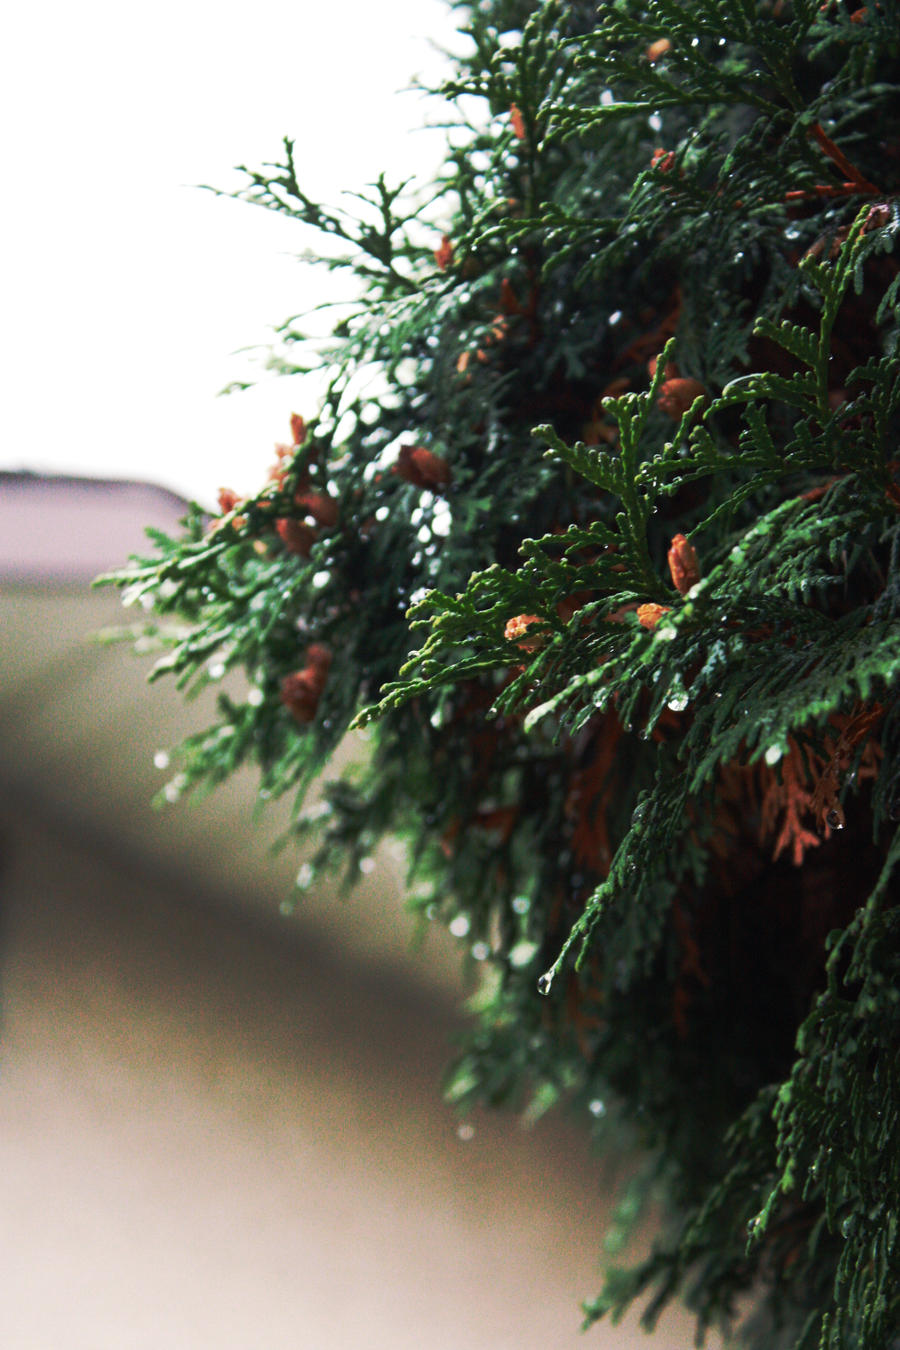 evergreen2 by fermented-elegance